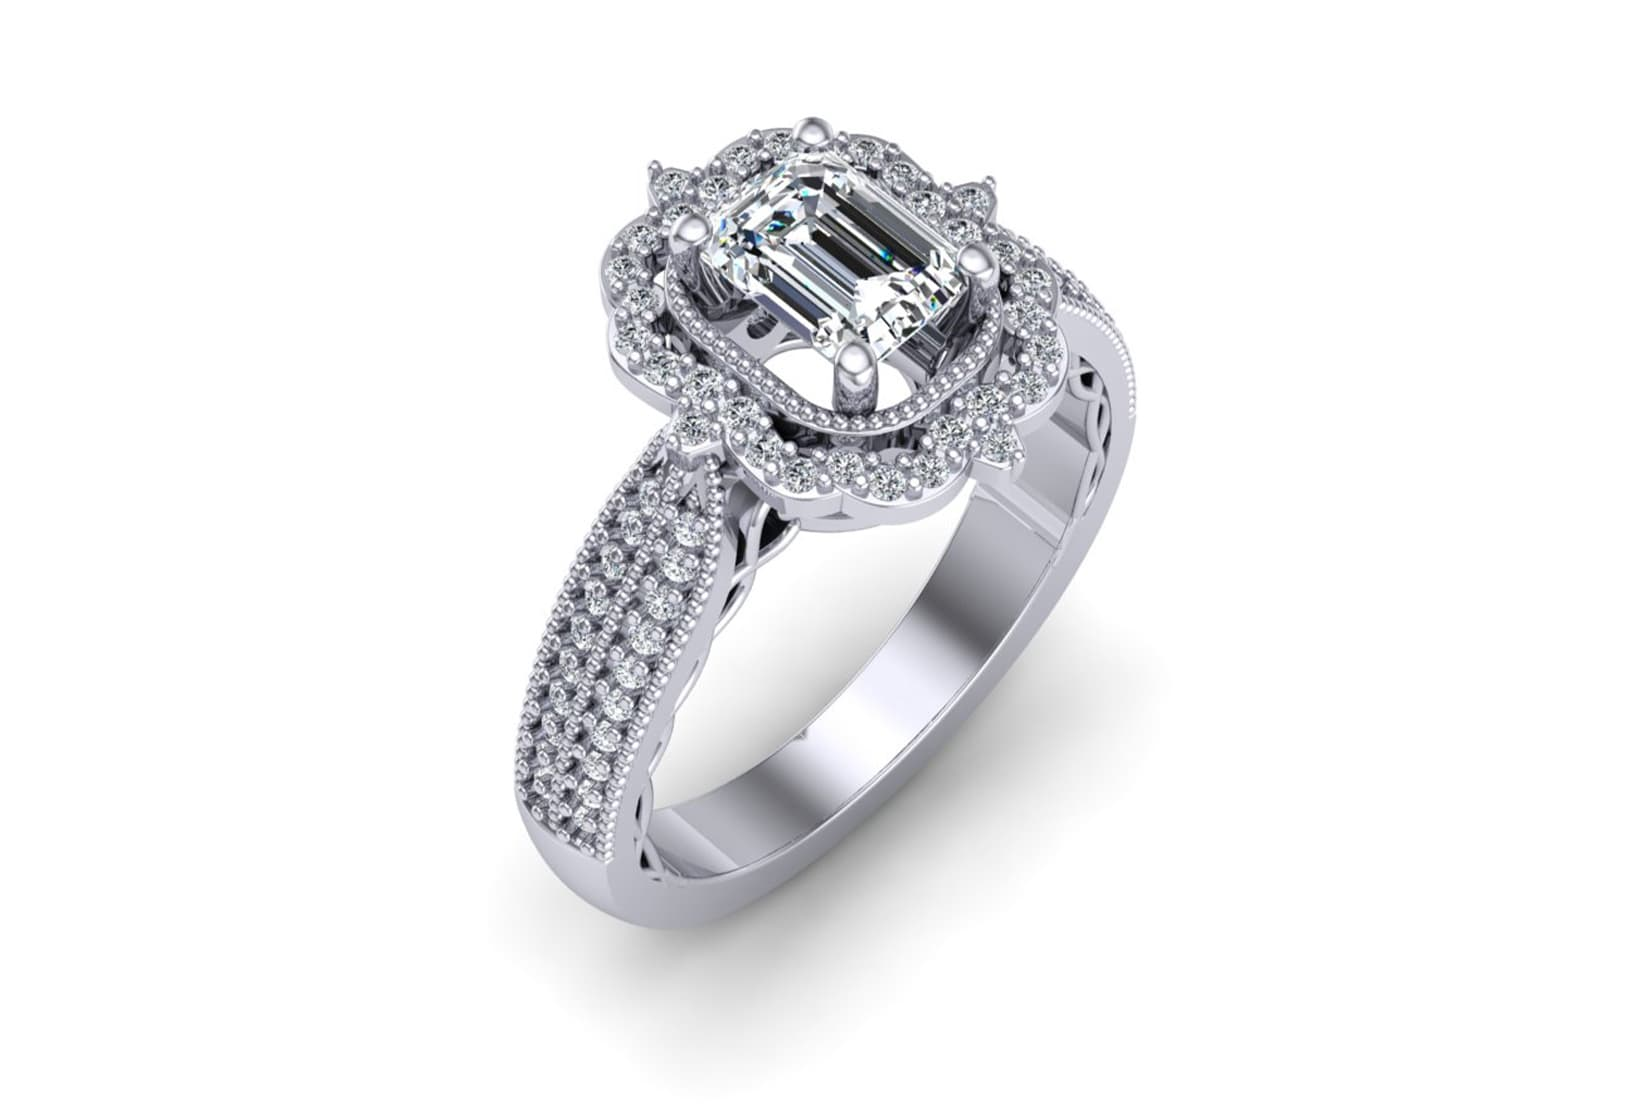 An image of Cassie's custom designed ring